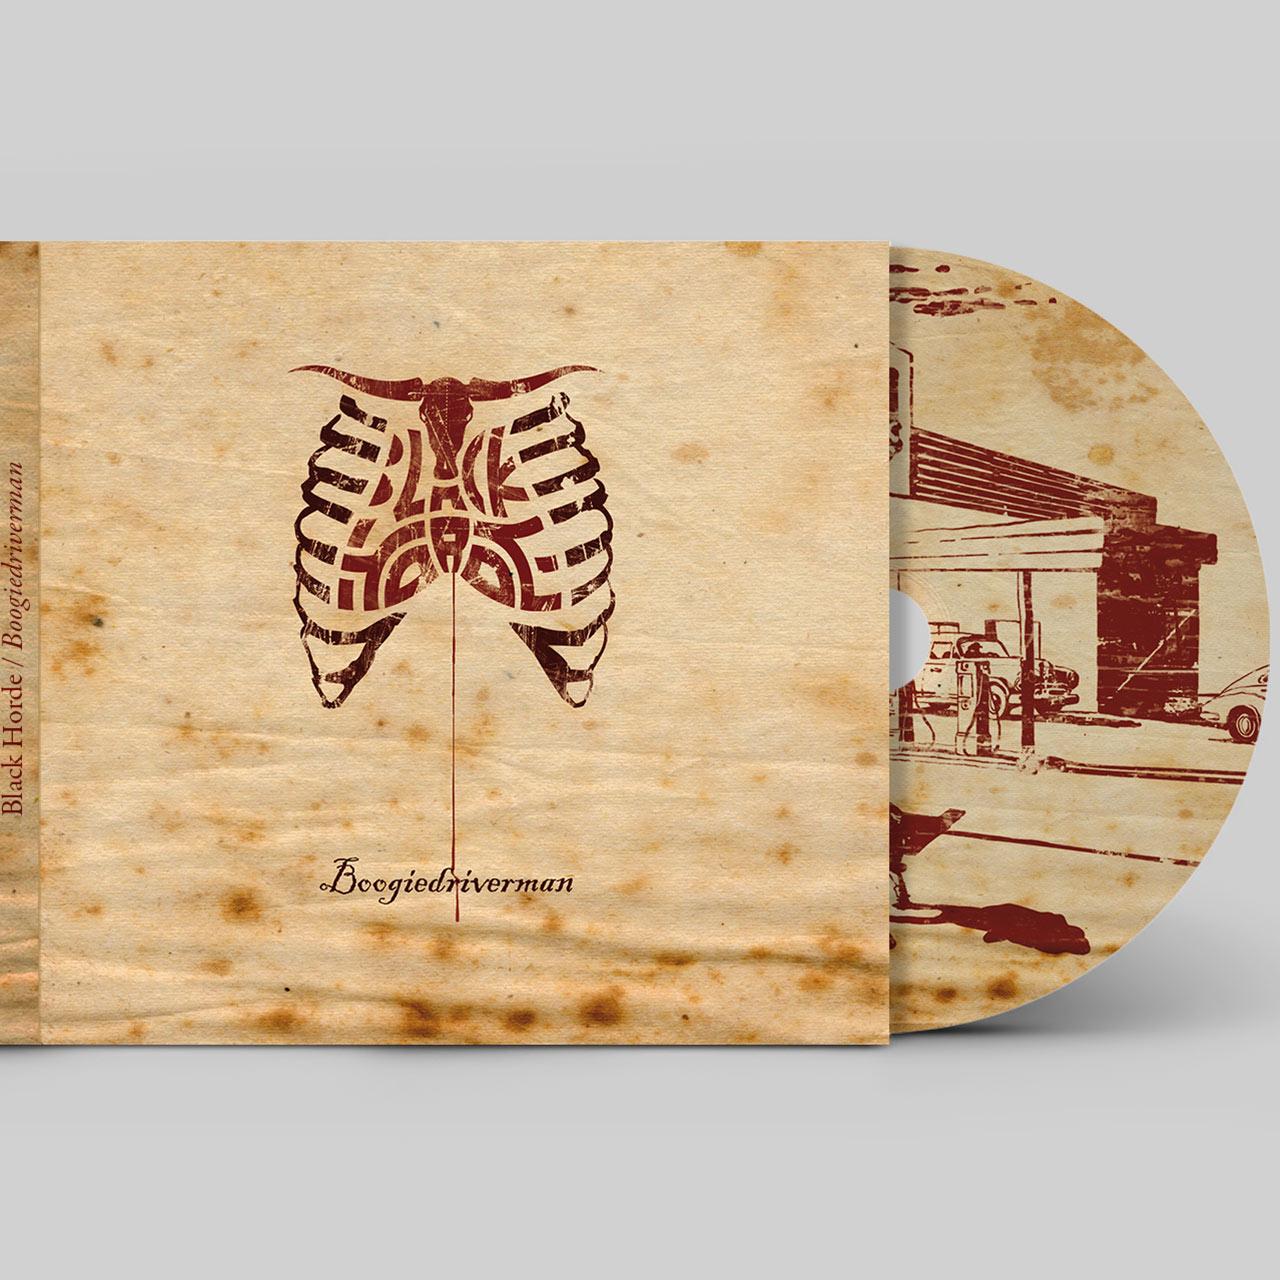 Black Horde / CD artwork